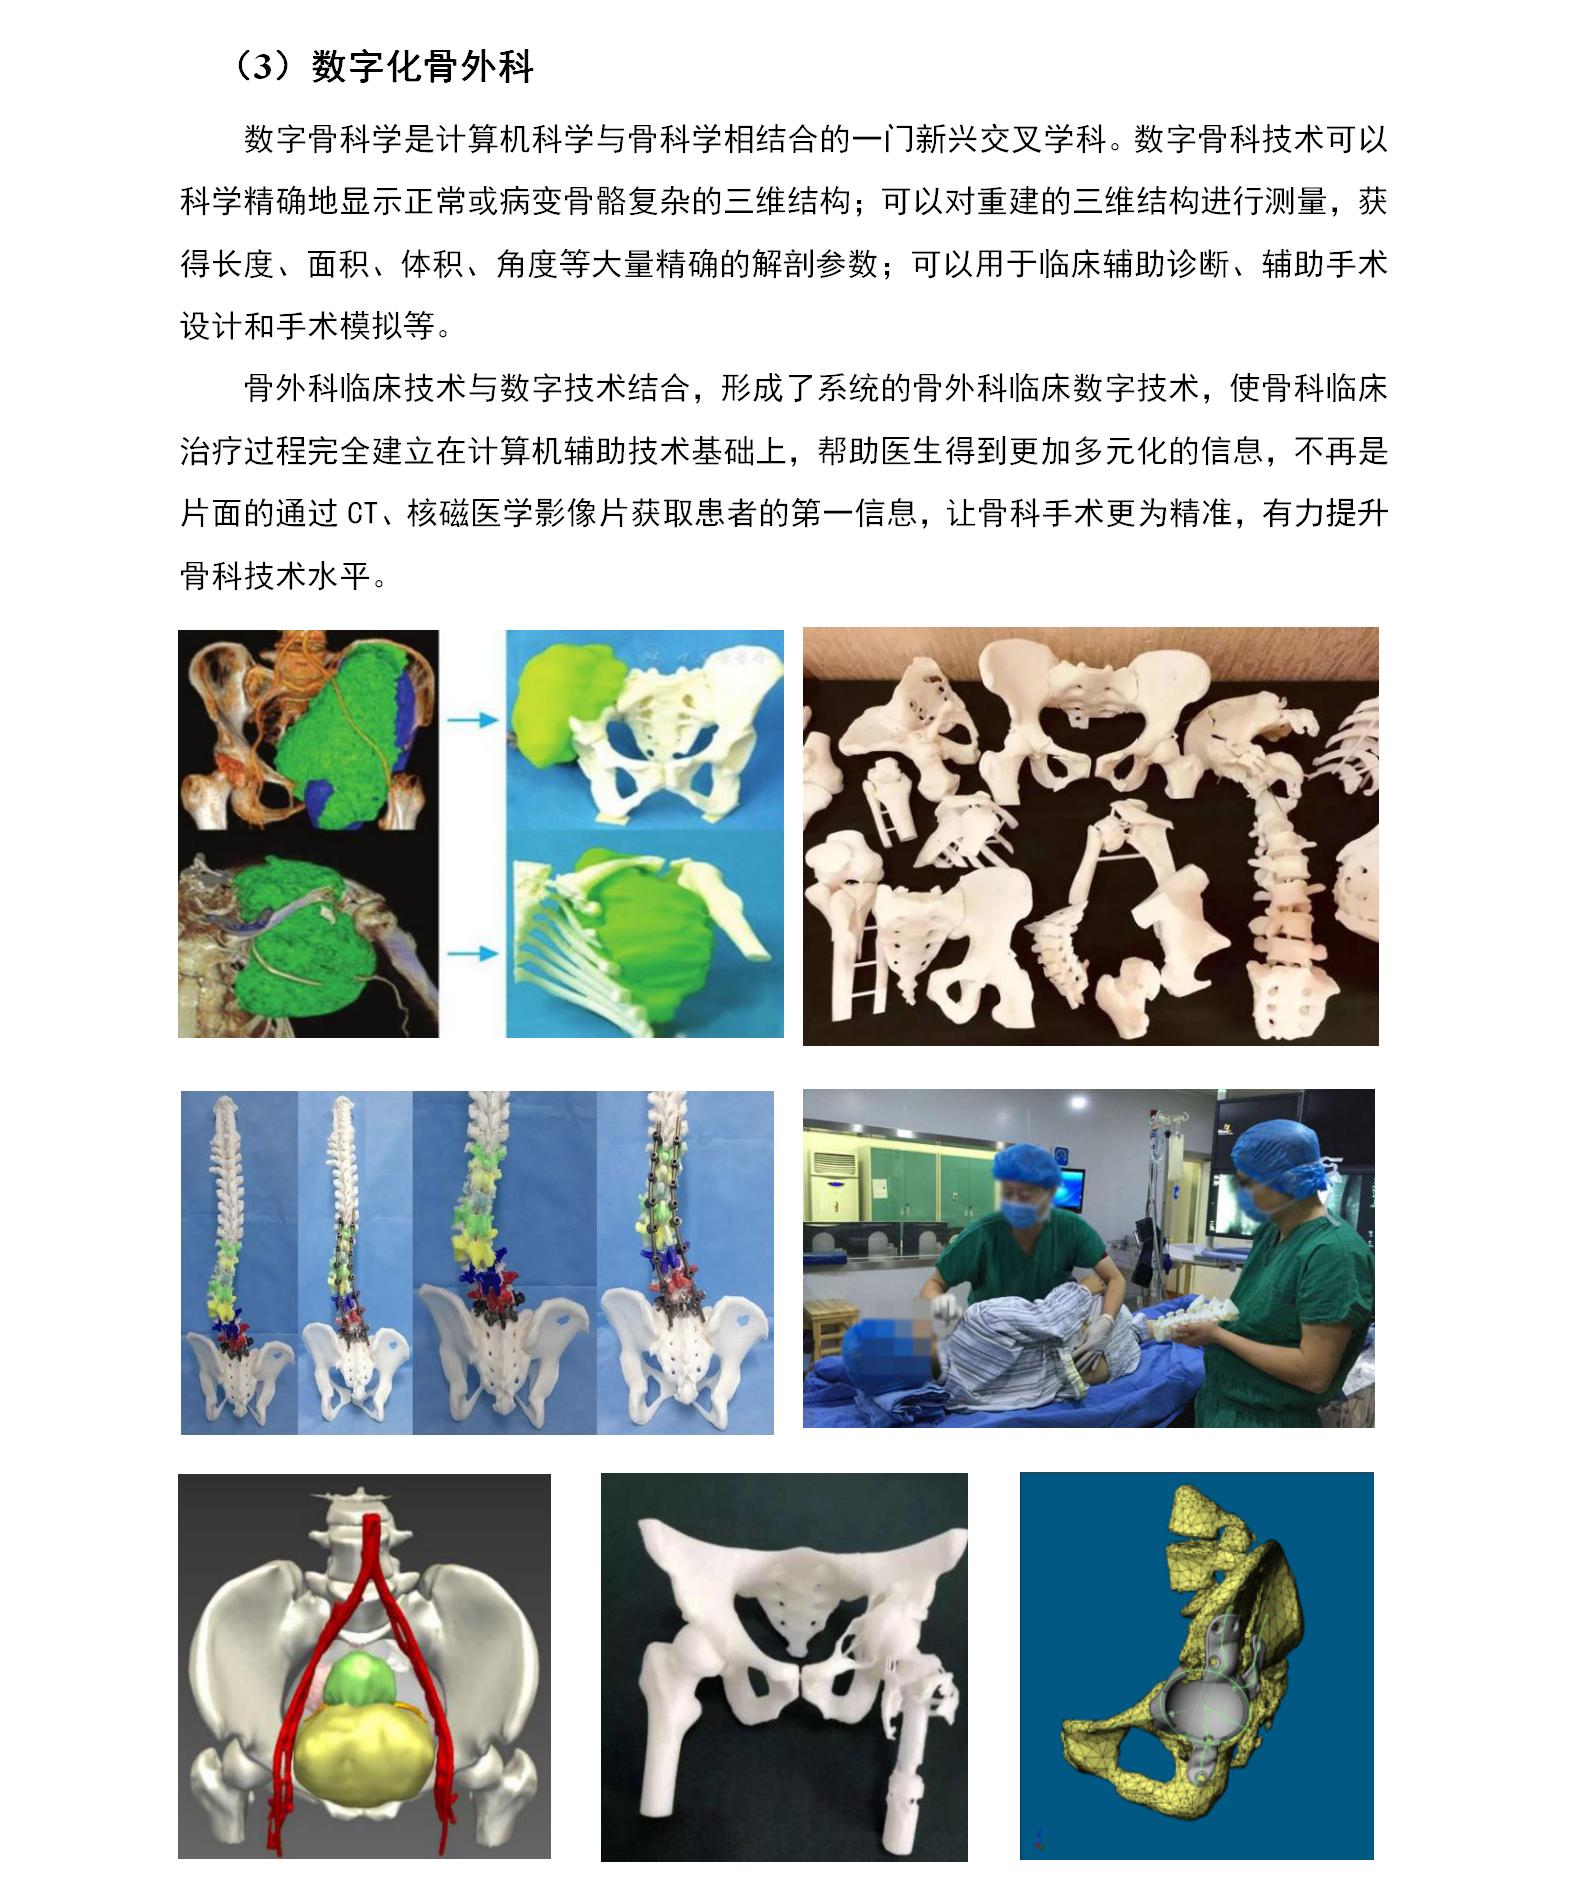 [CropImg]甘肃乐动体育app特科技有限公司2019V_15.png